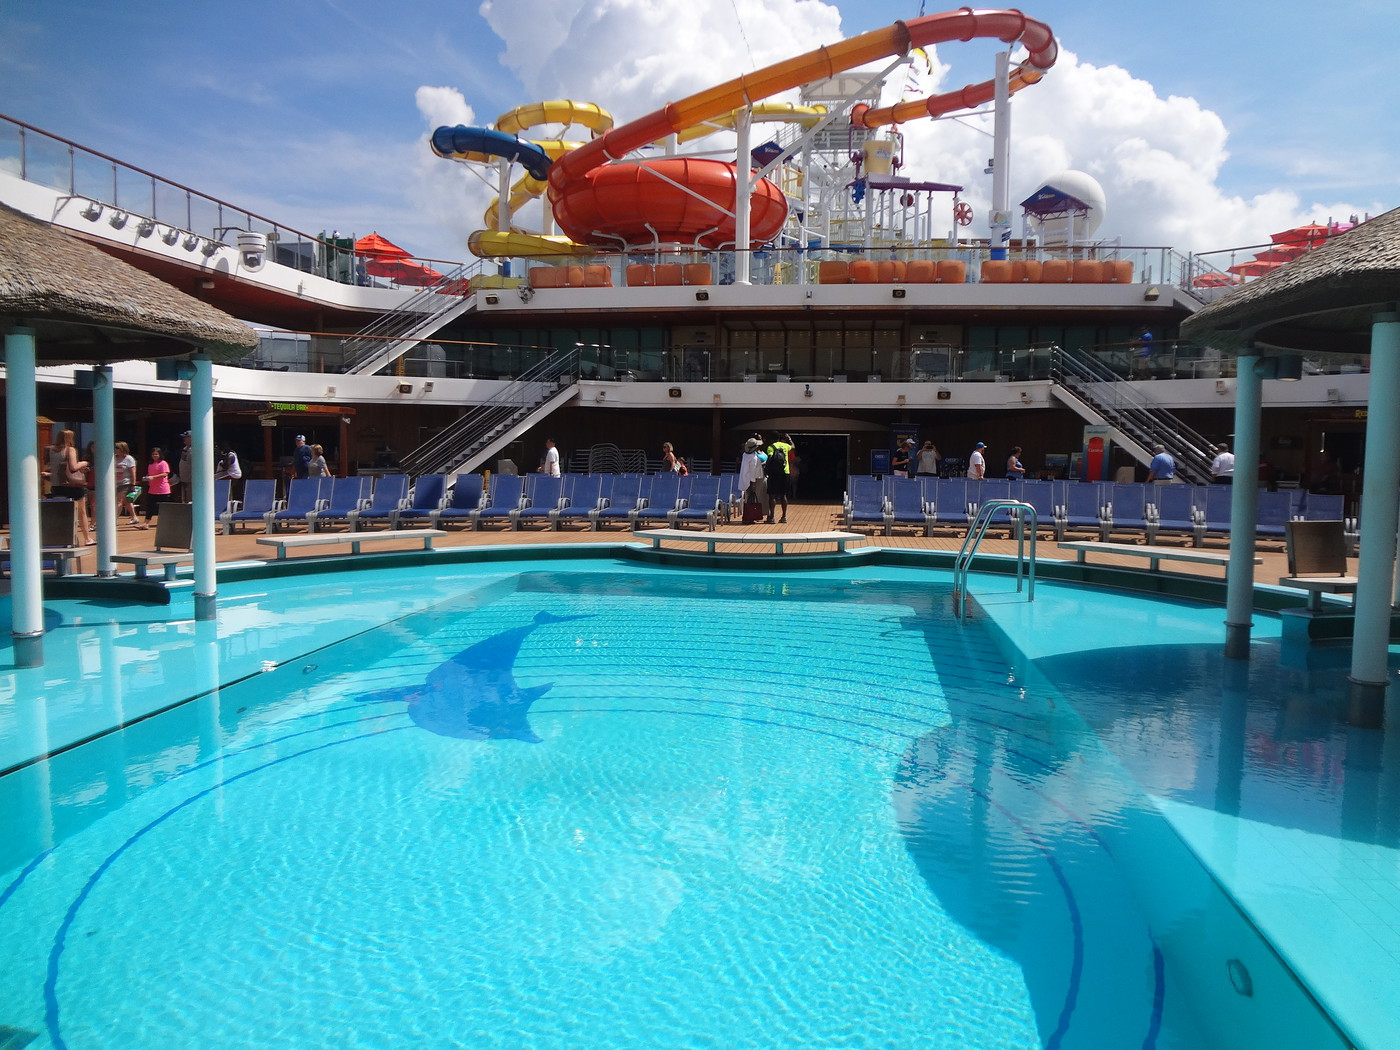 Carnival magic september 24 2016 report cruise critic for Pool trade show magic